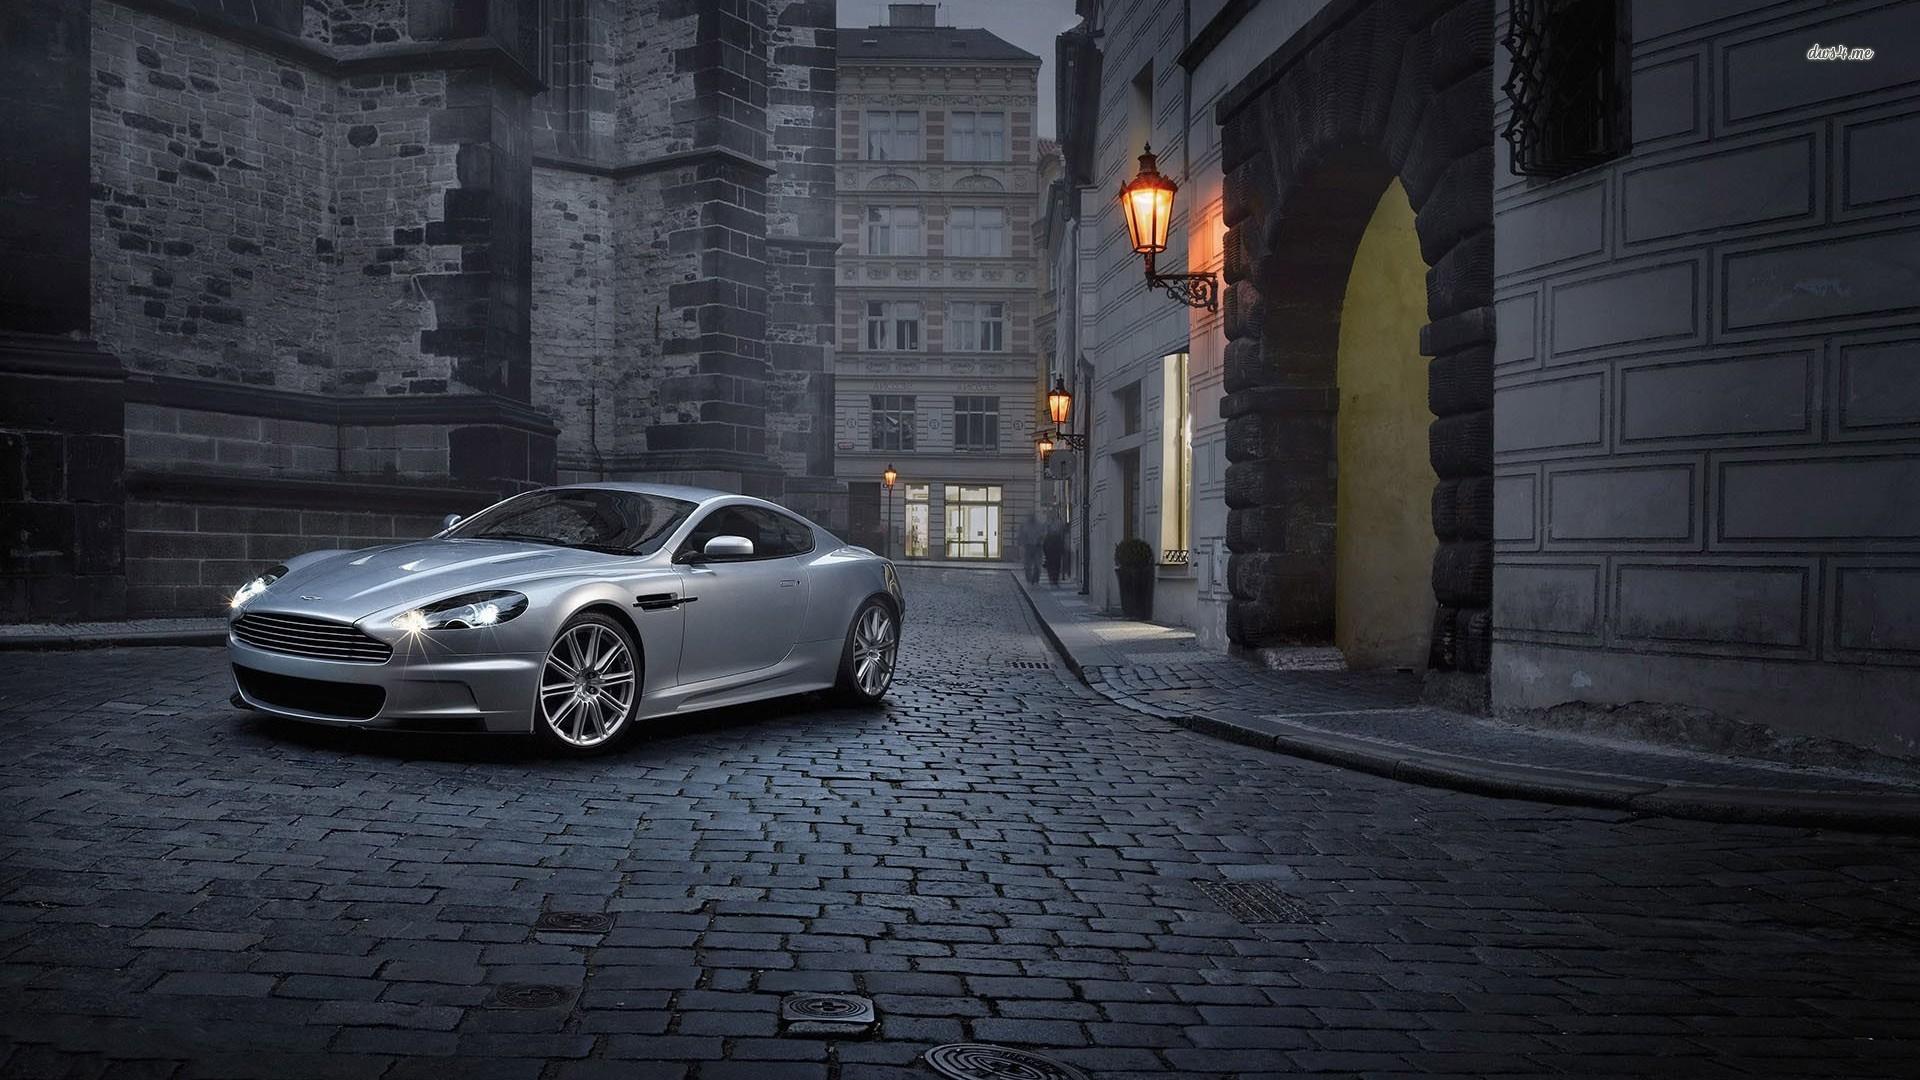 Aston Martin Wallpaper 3